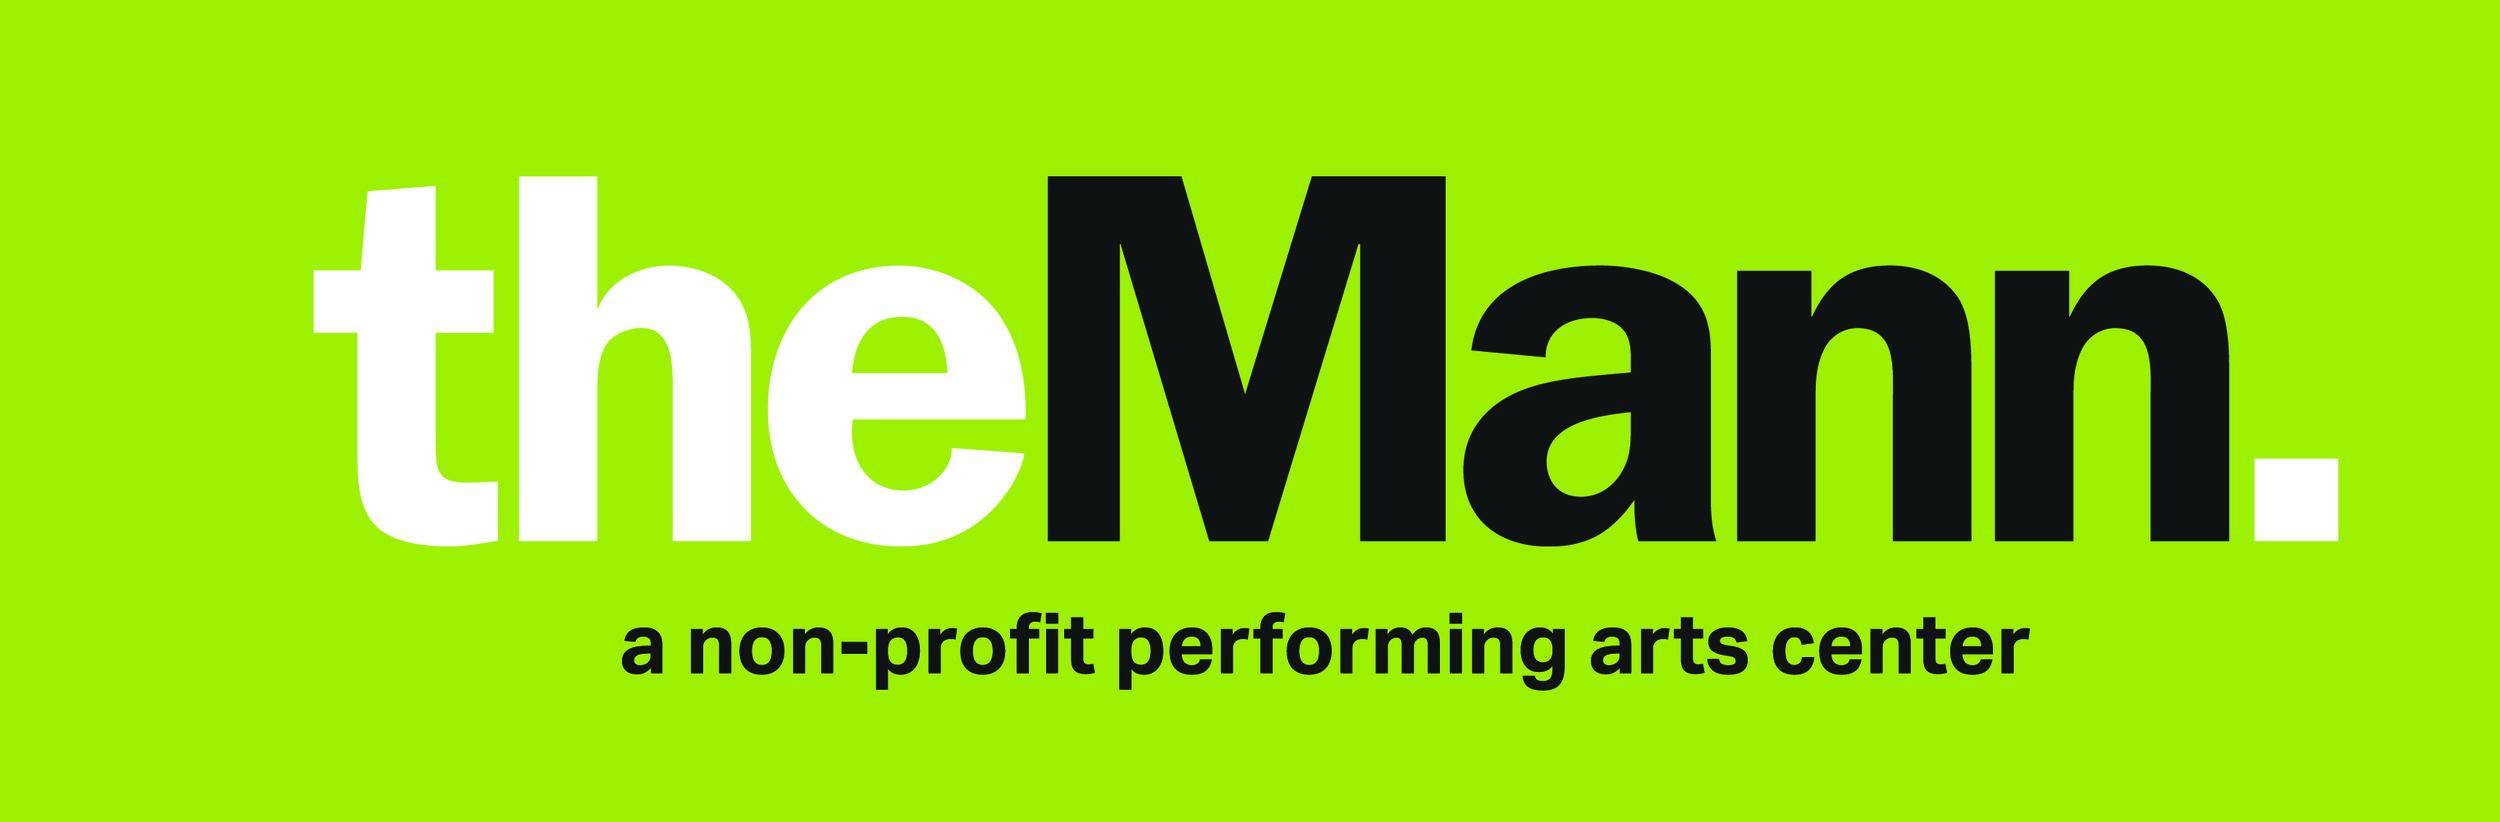 theMann-Nonprofit-on Green.jpg